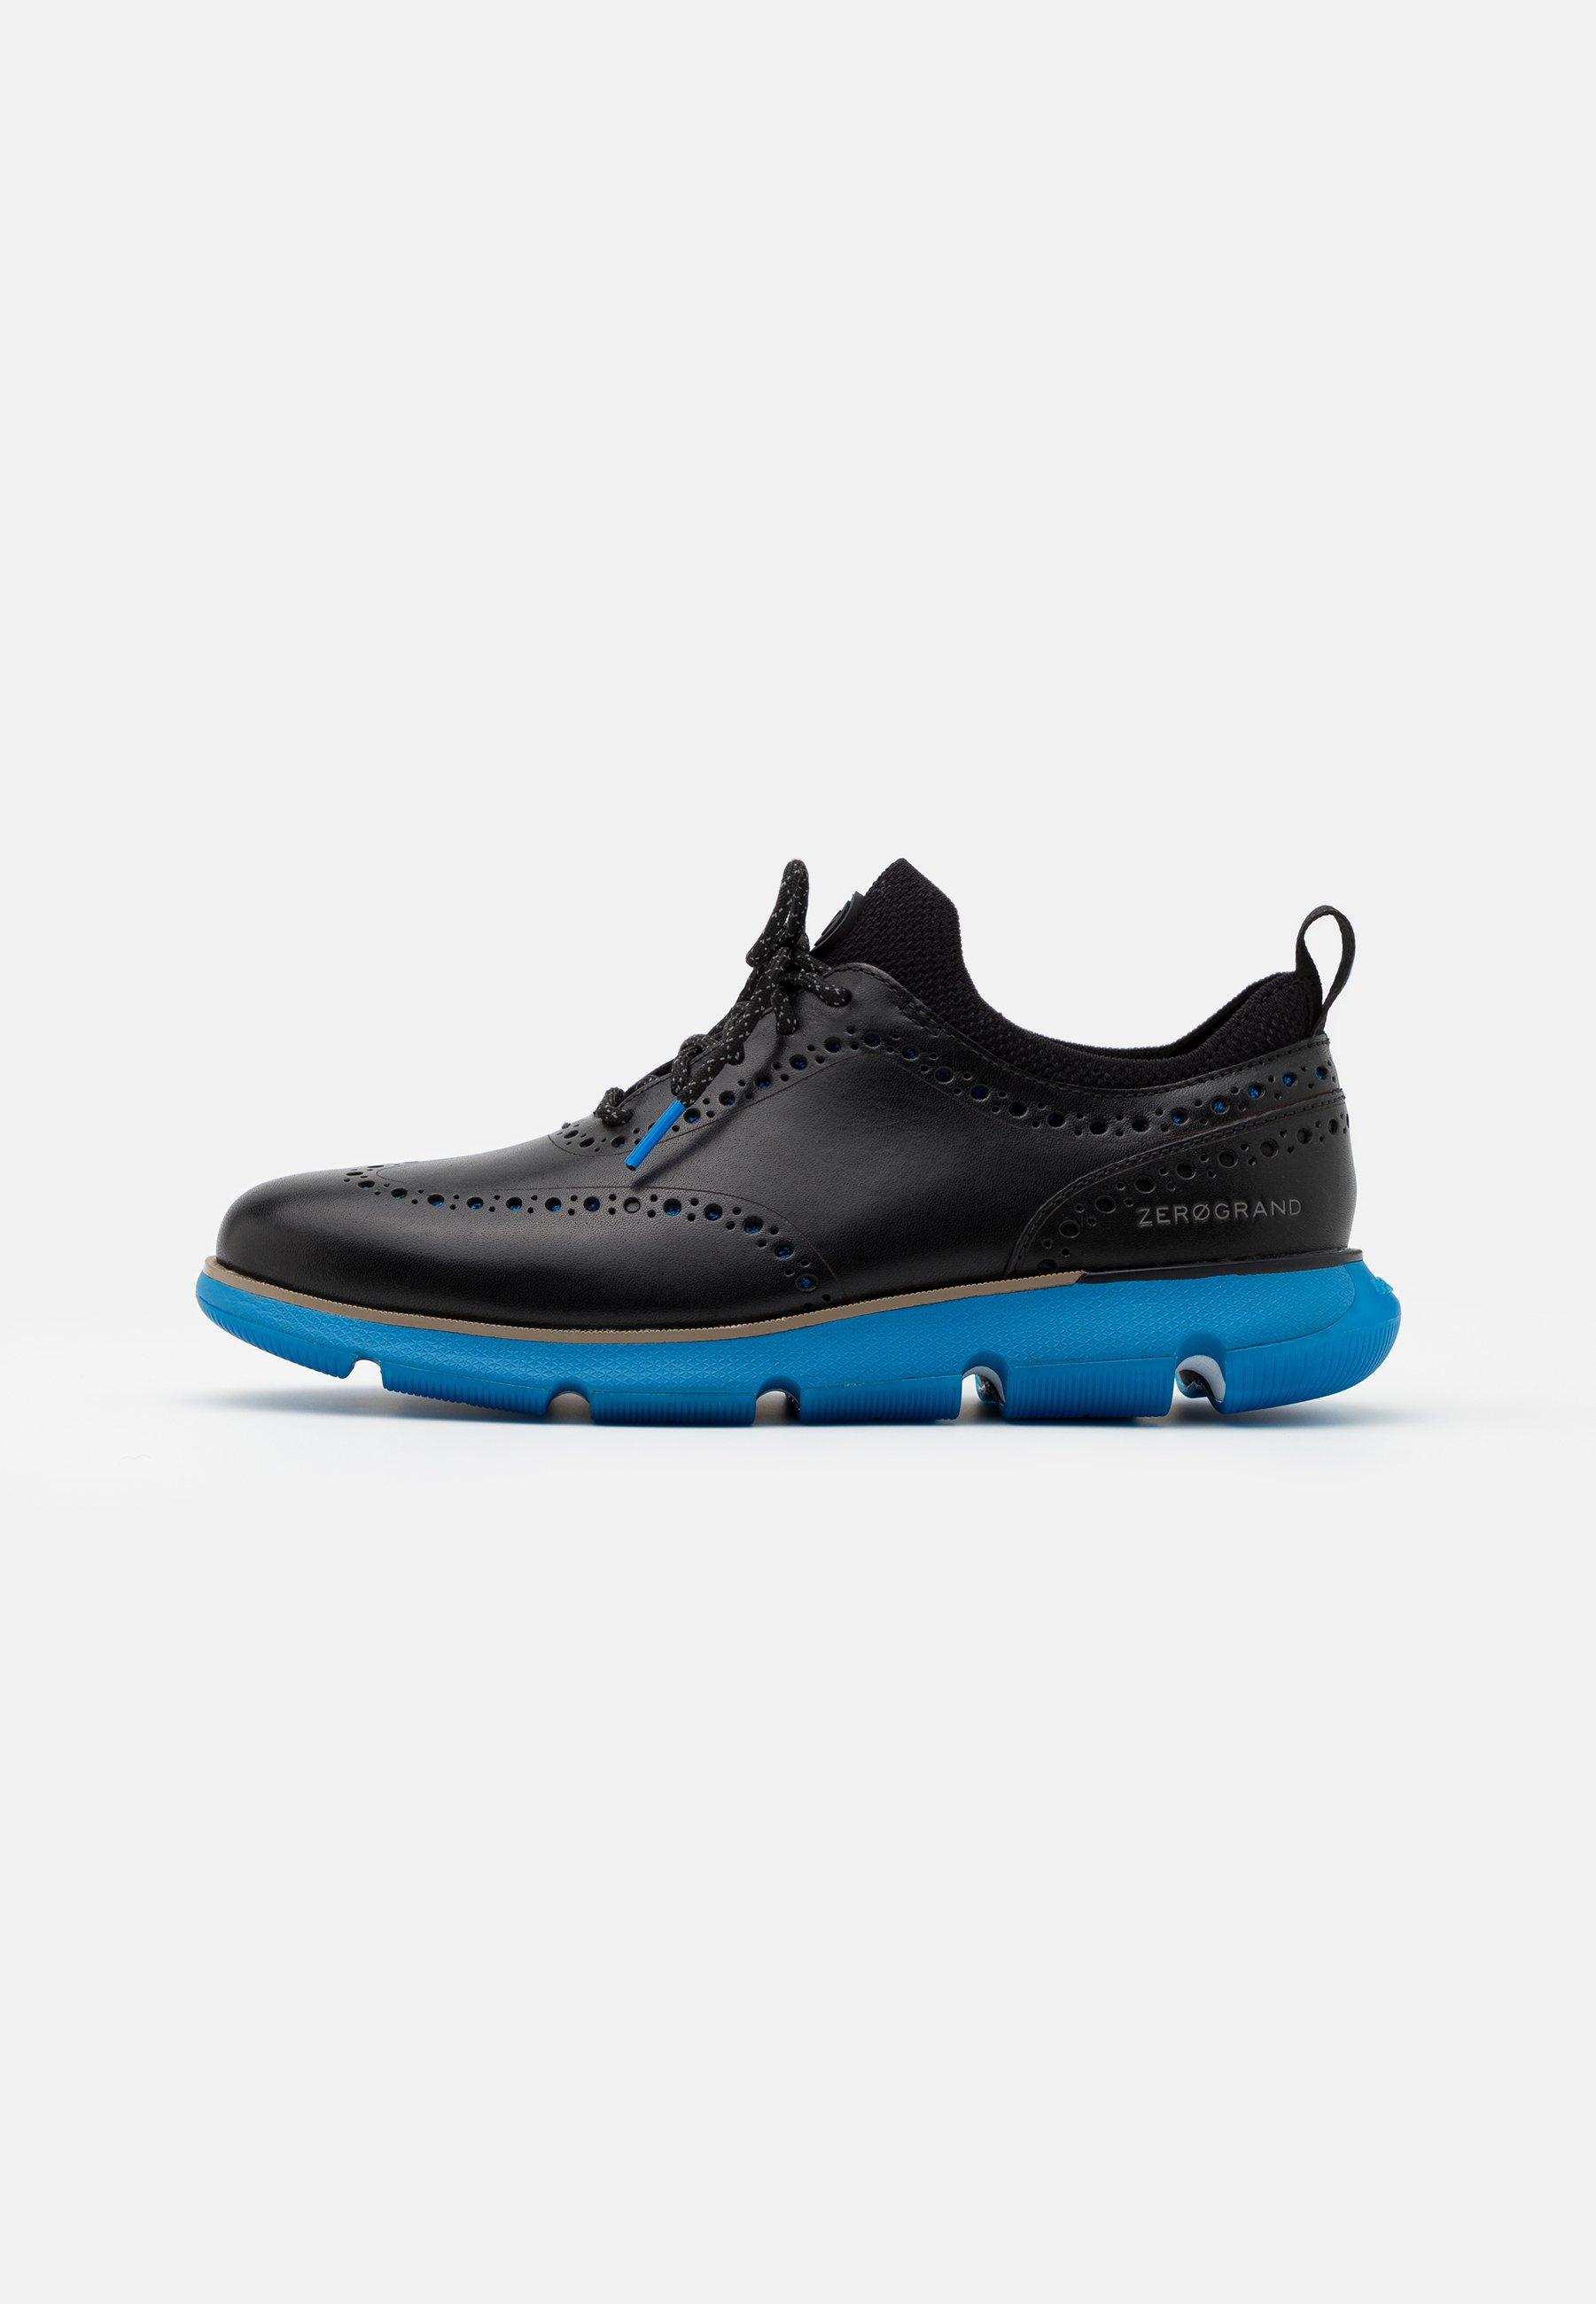 Blue Zerrogrand Stichlite  Cole Haan  Sneakers - Sko Til Herre